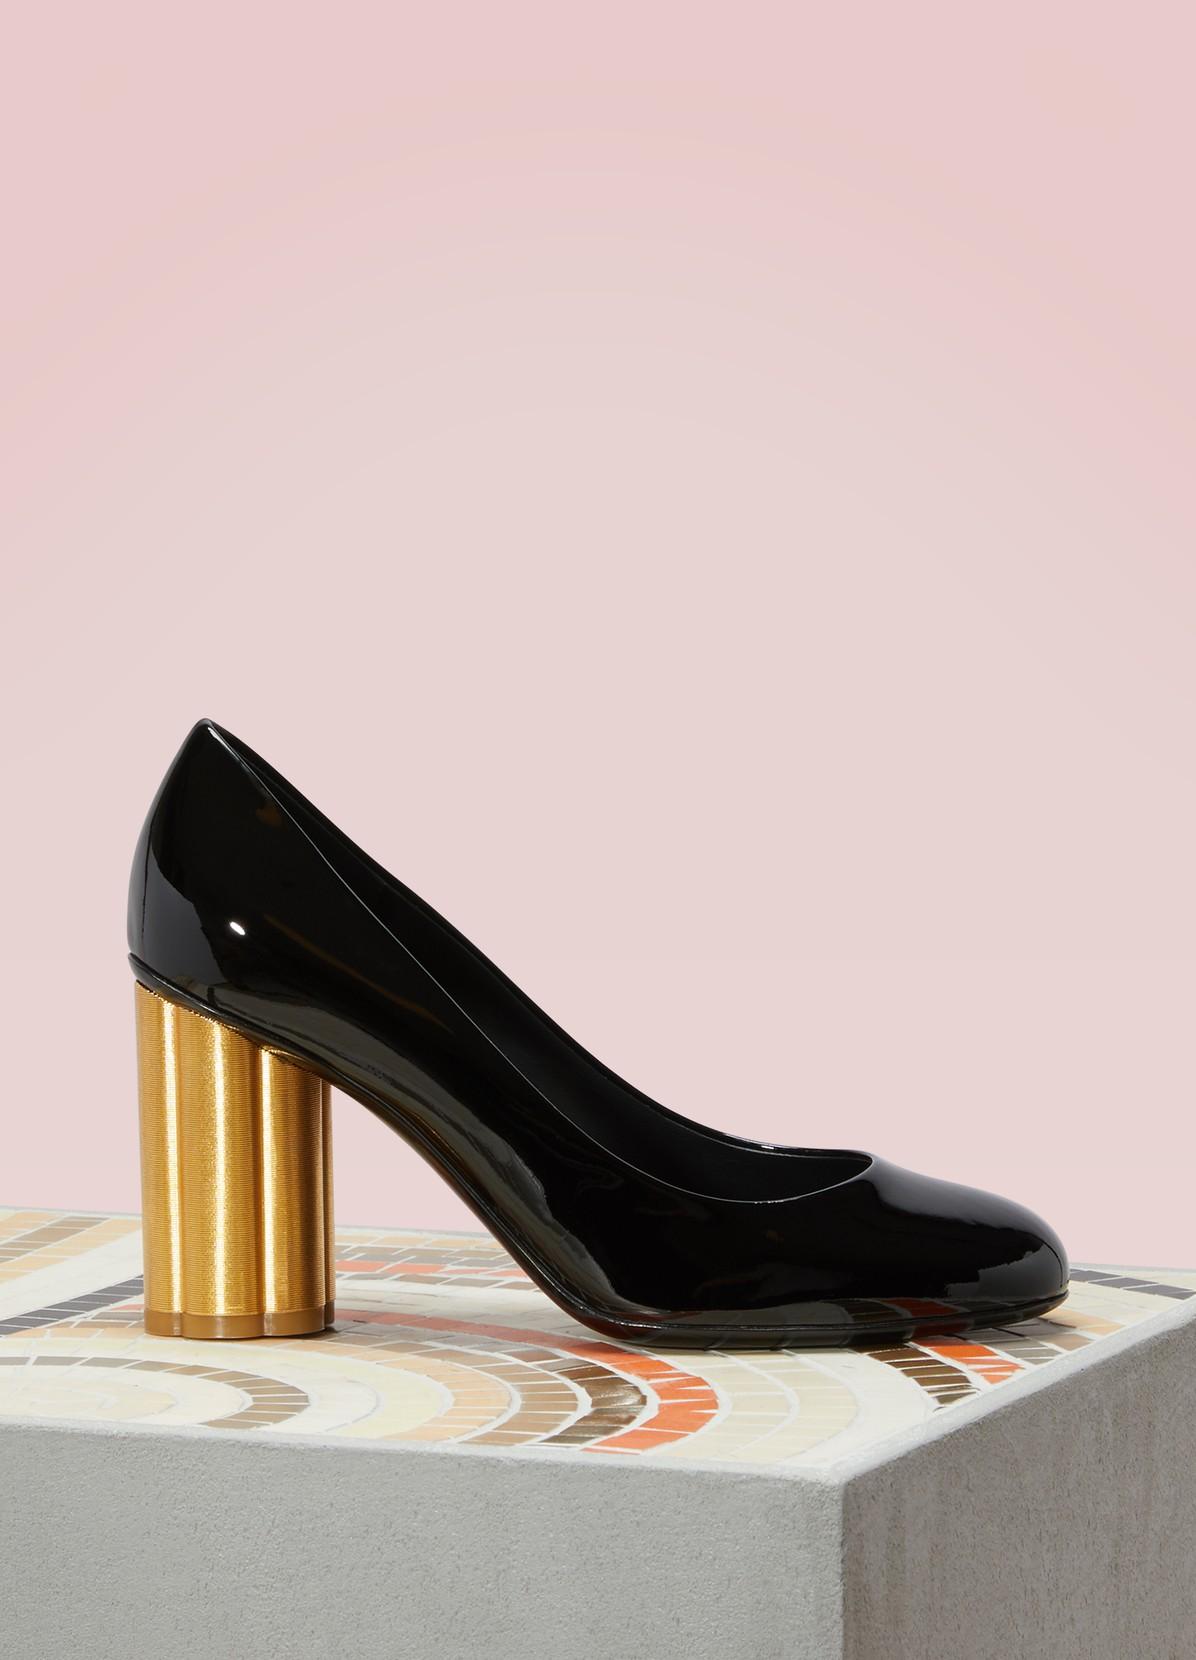 04732310b79d2 SALVATORE FERRAGAMO Lucca high heels patent leather pumps